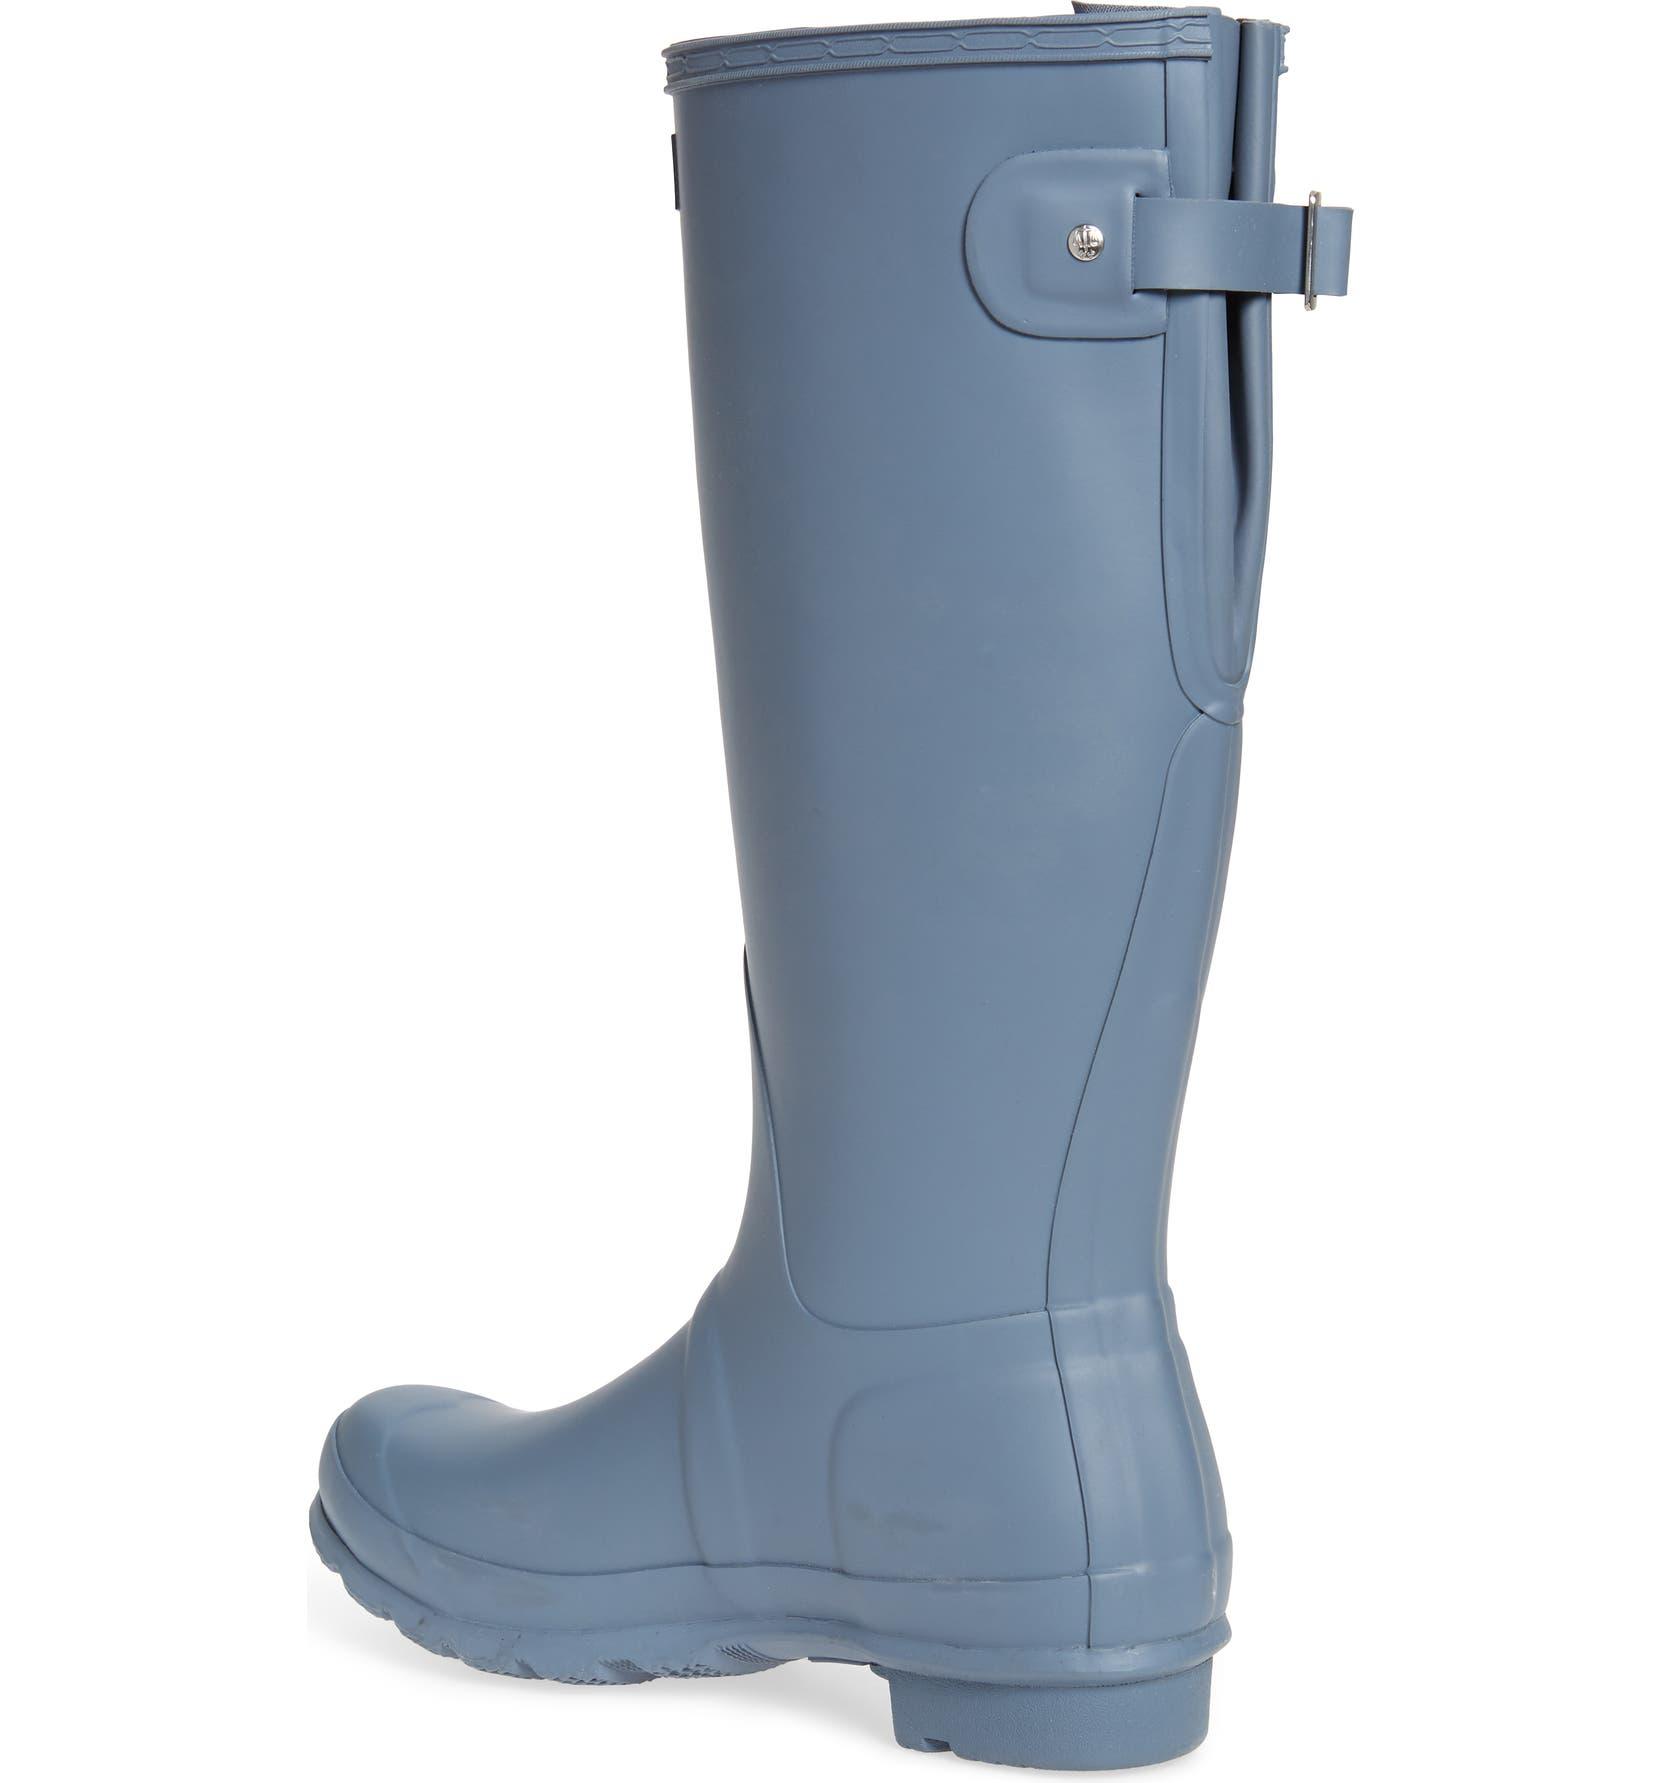 d816c3482d1 Hunter Original Tall Adjustable Back Waterproof Rain Boot (Women ...